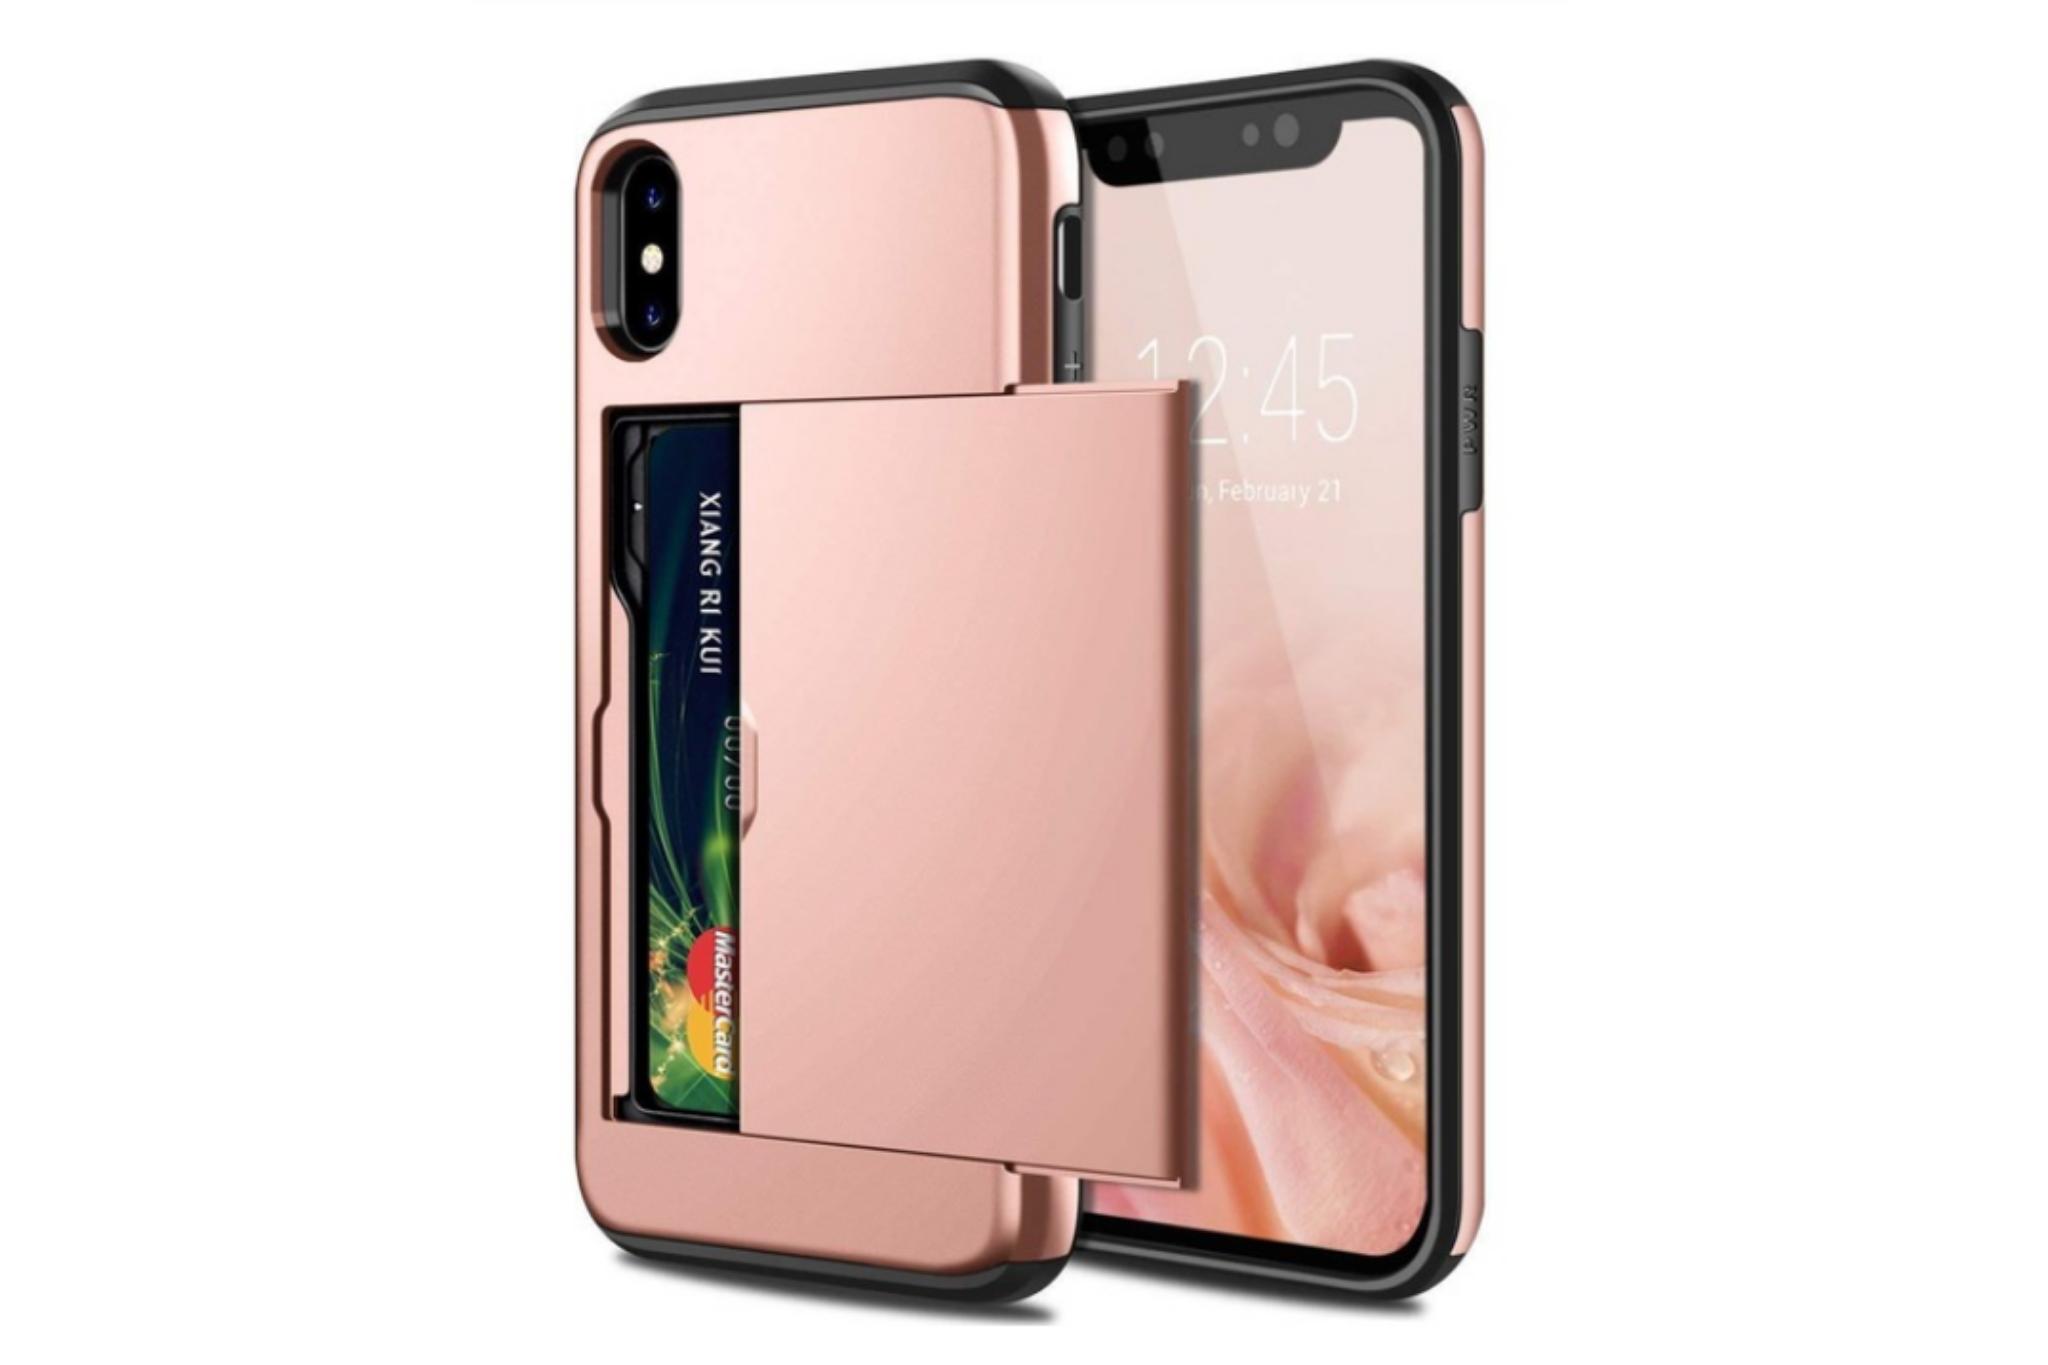 Smartphonehoesje iPhone 11 | Pasjesschuif rose gold